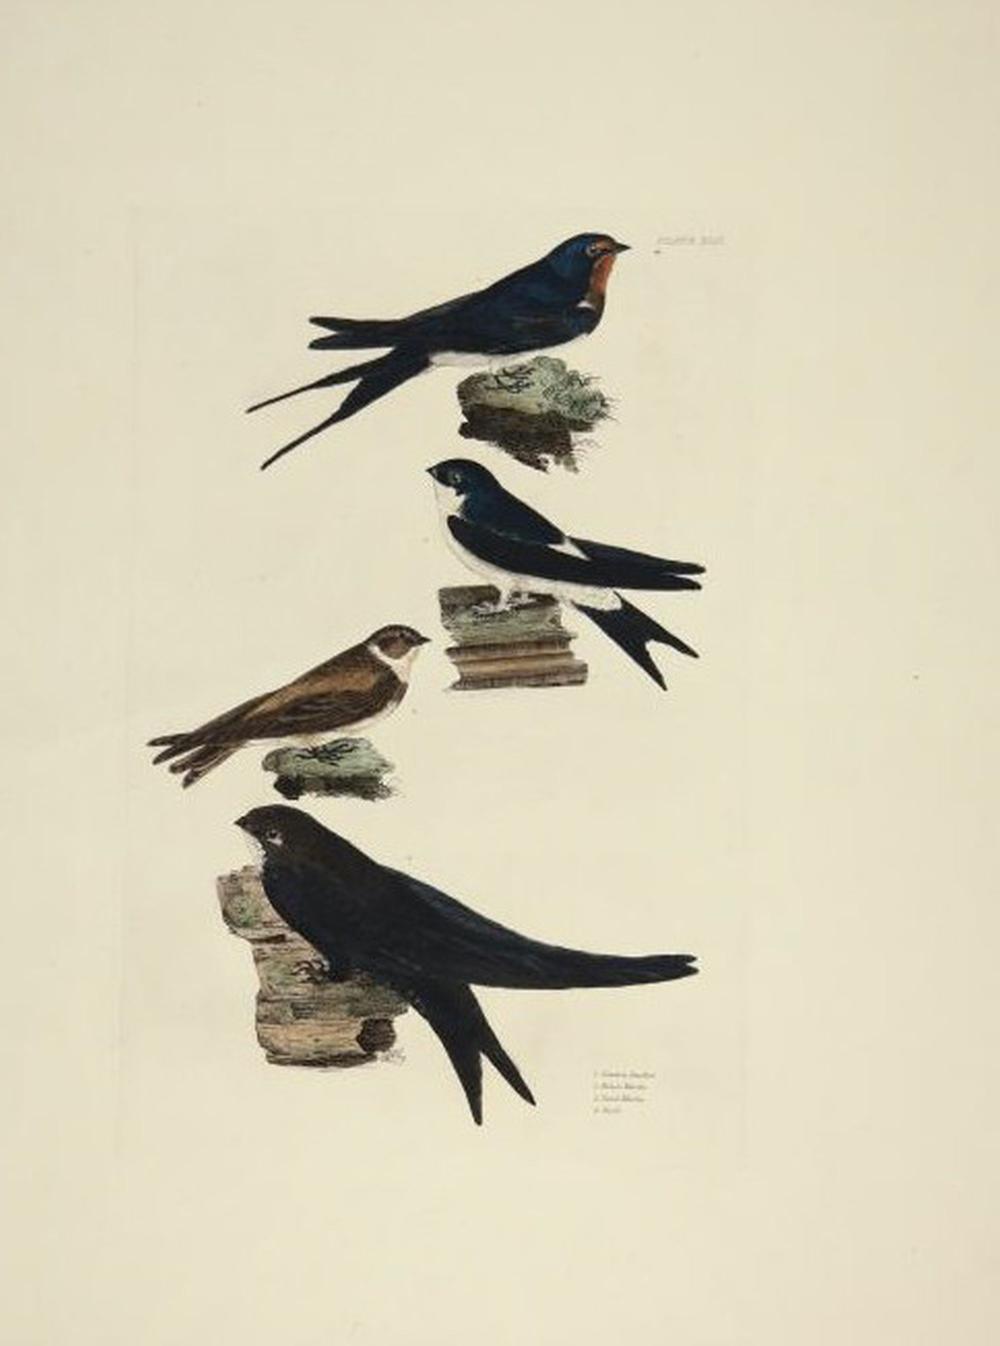 Prideaux John Selby. 2 plates, British Ornithology